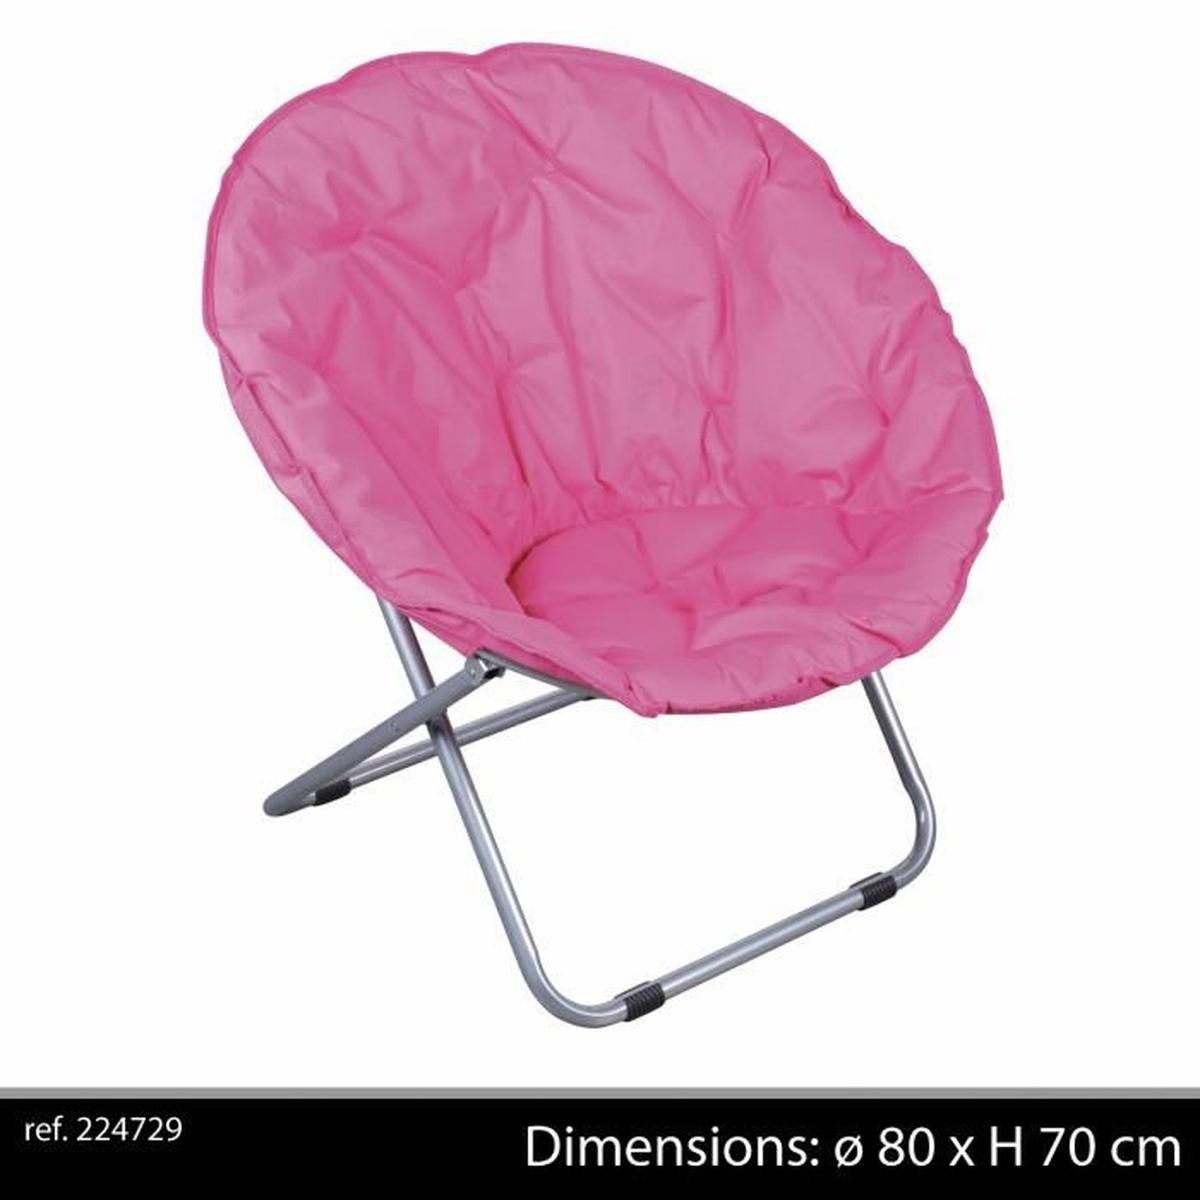 Fauteuil Pliant Rose Fushia Loveuse Chaise Tissu Design Salon Camping intérieur Loveuse Jardin